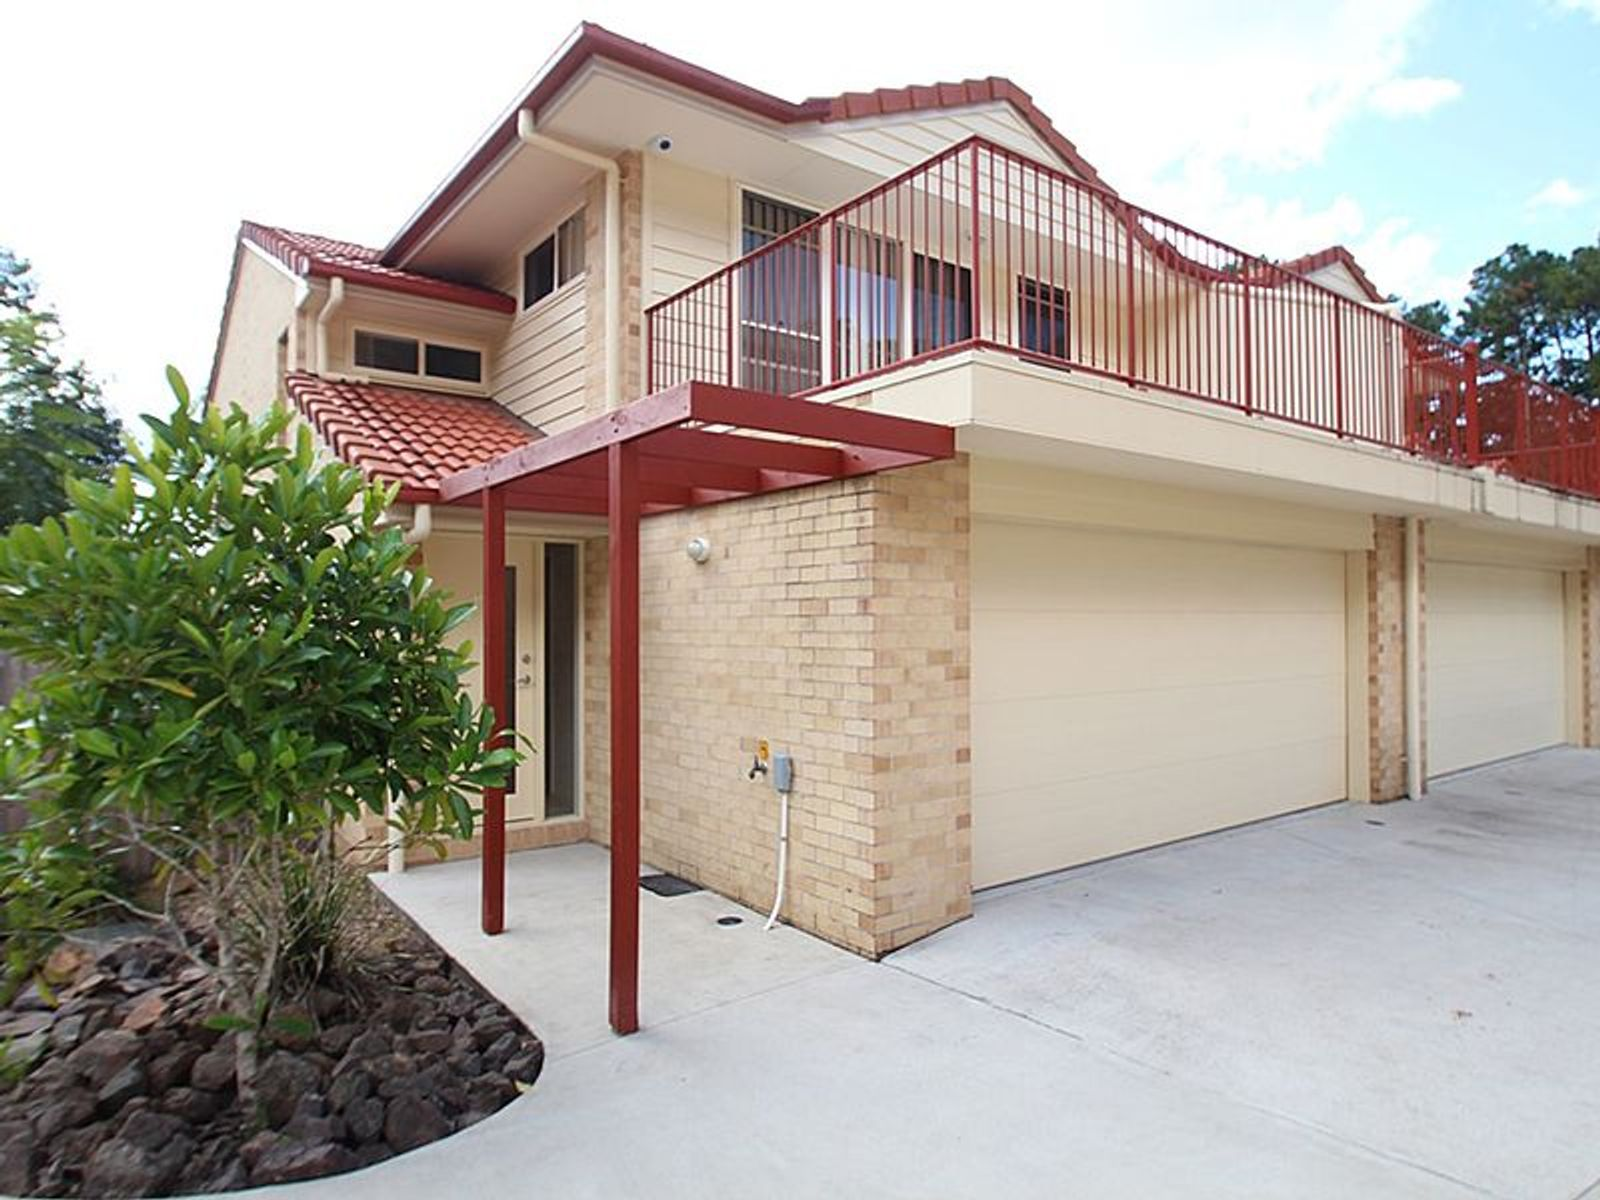 21/14-18 Bade Street, Nambour, QLD 4560